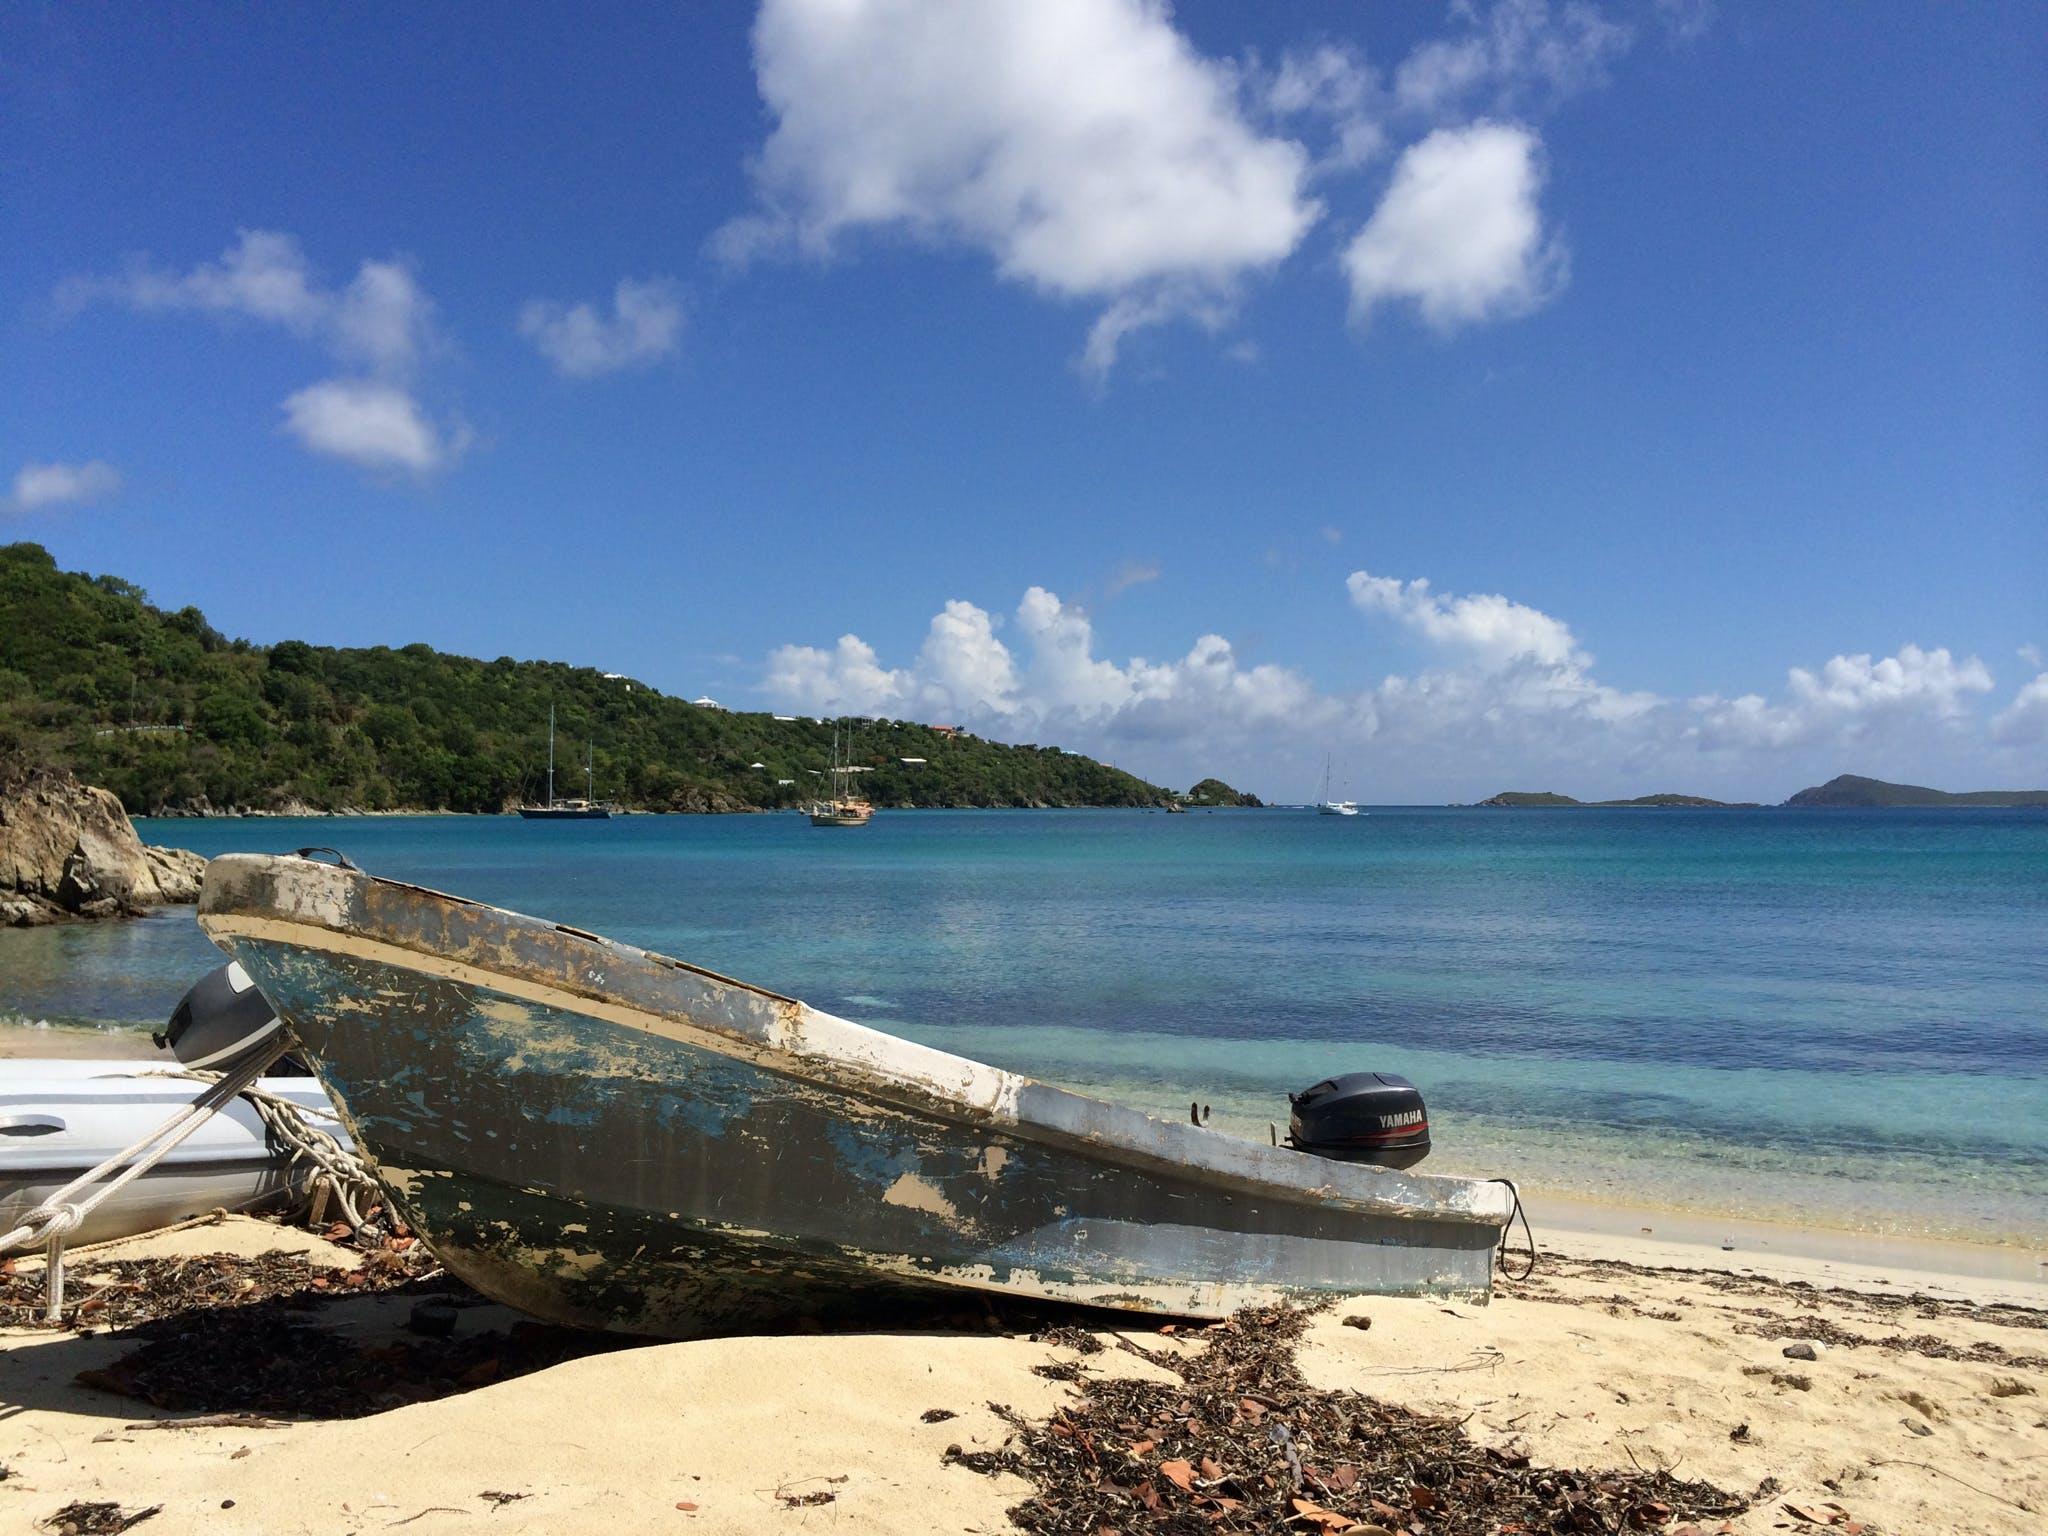 Free stock photo of caribbean, old boat, St. John, Vie's Beach